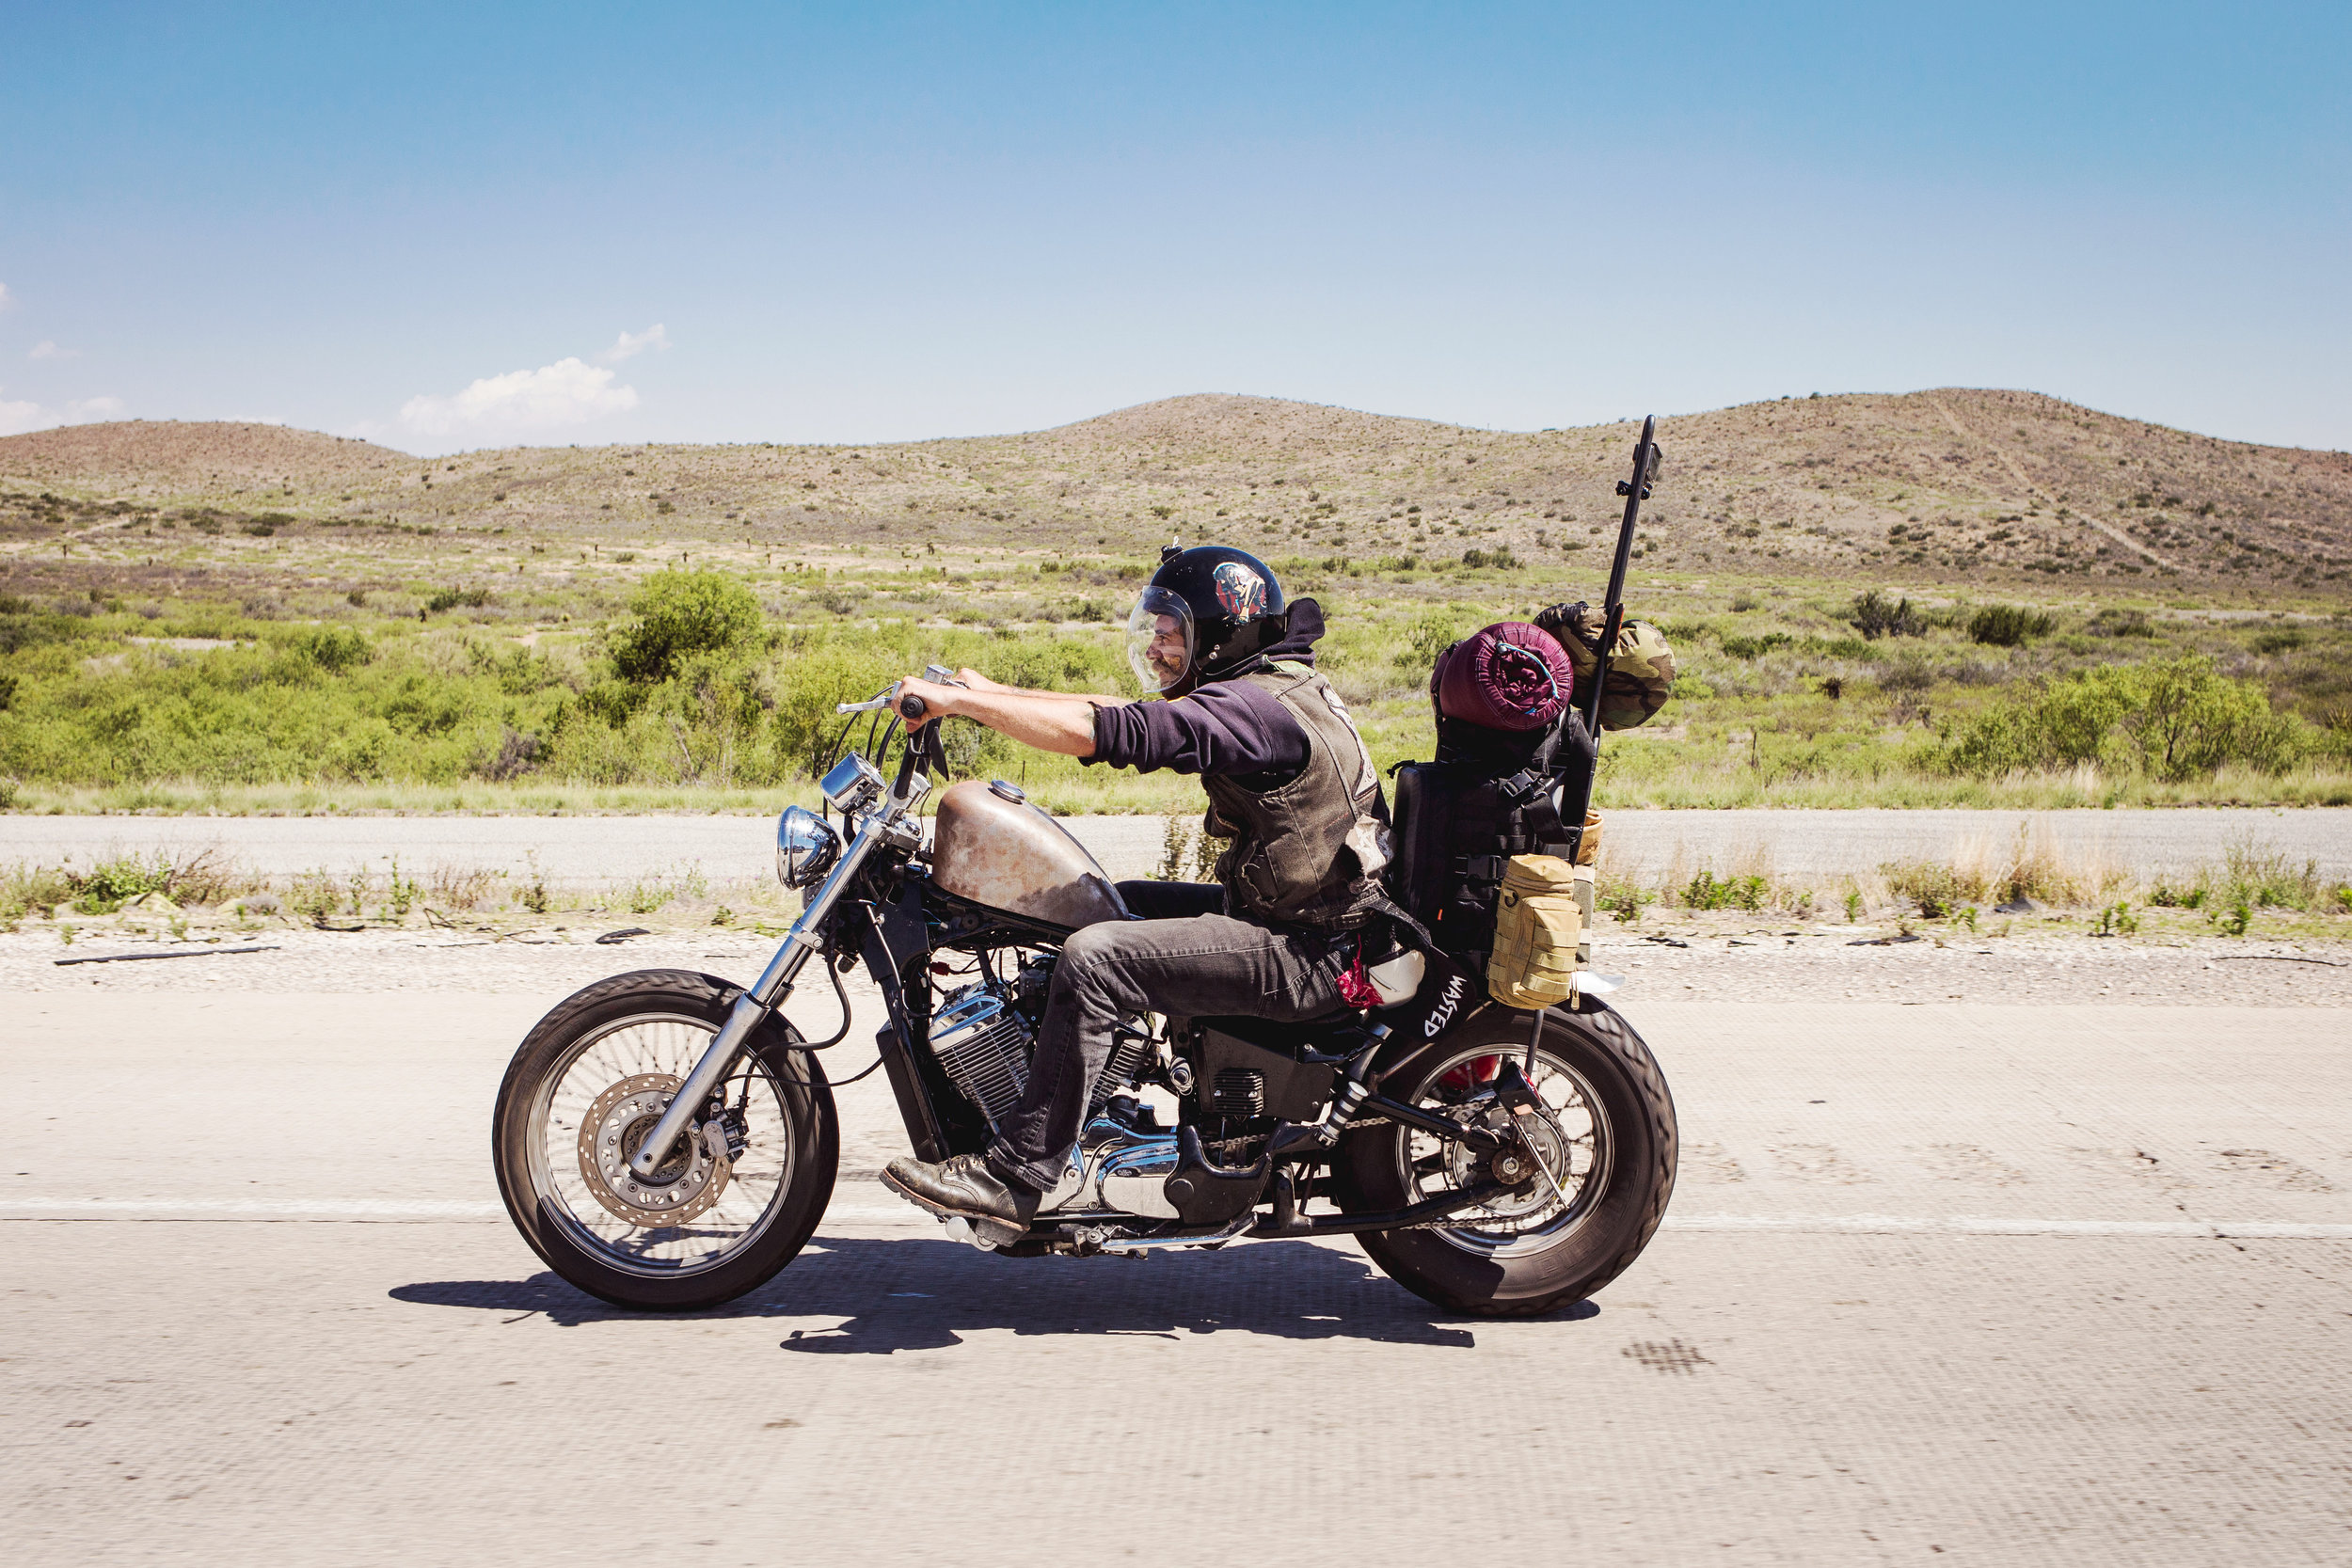 2017_05_10 DRT Moto Rider-1216_REV.jpg